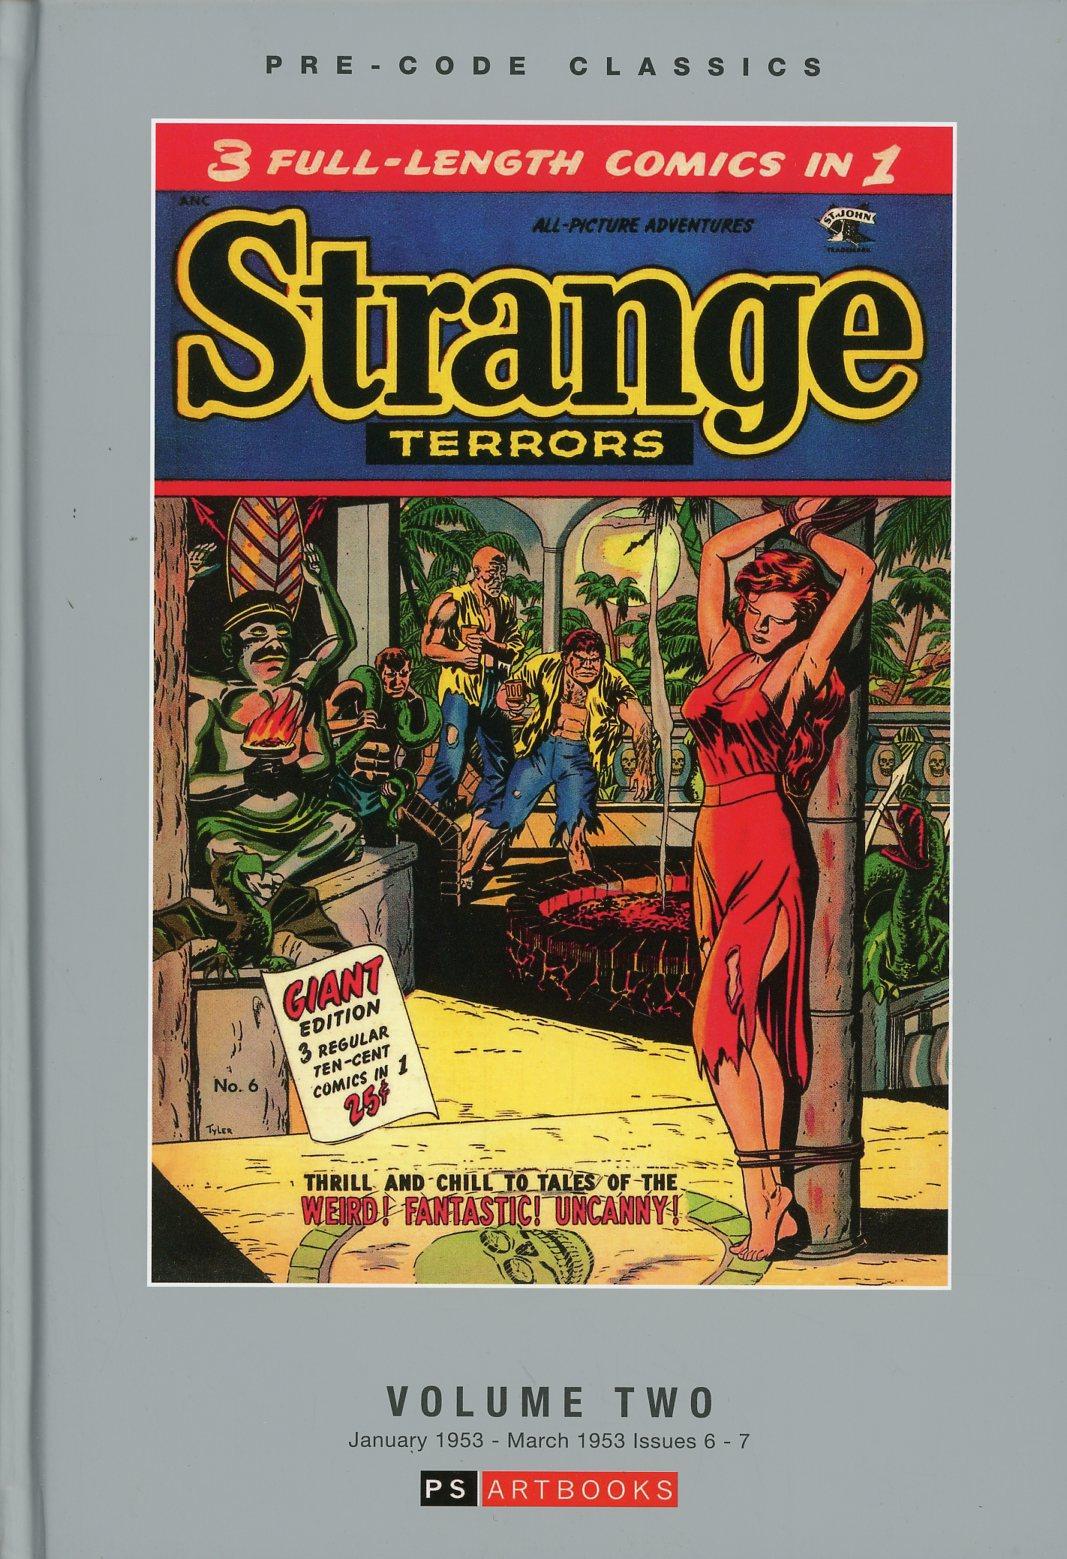 Pre-Code Classics Strange Terrors Vol 2 HC